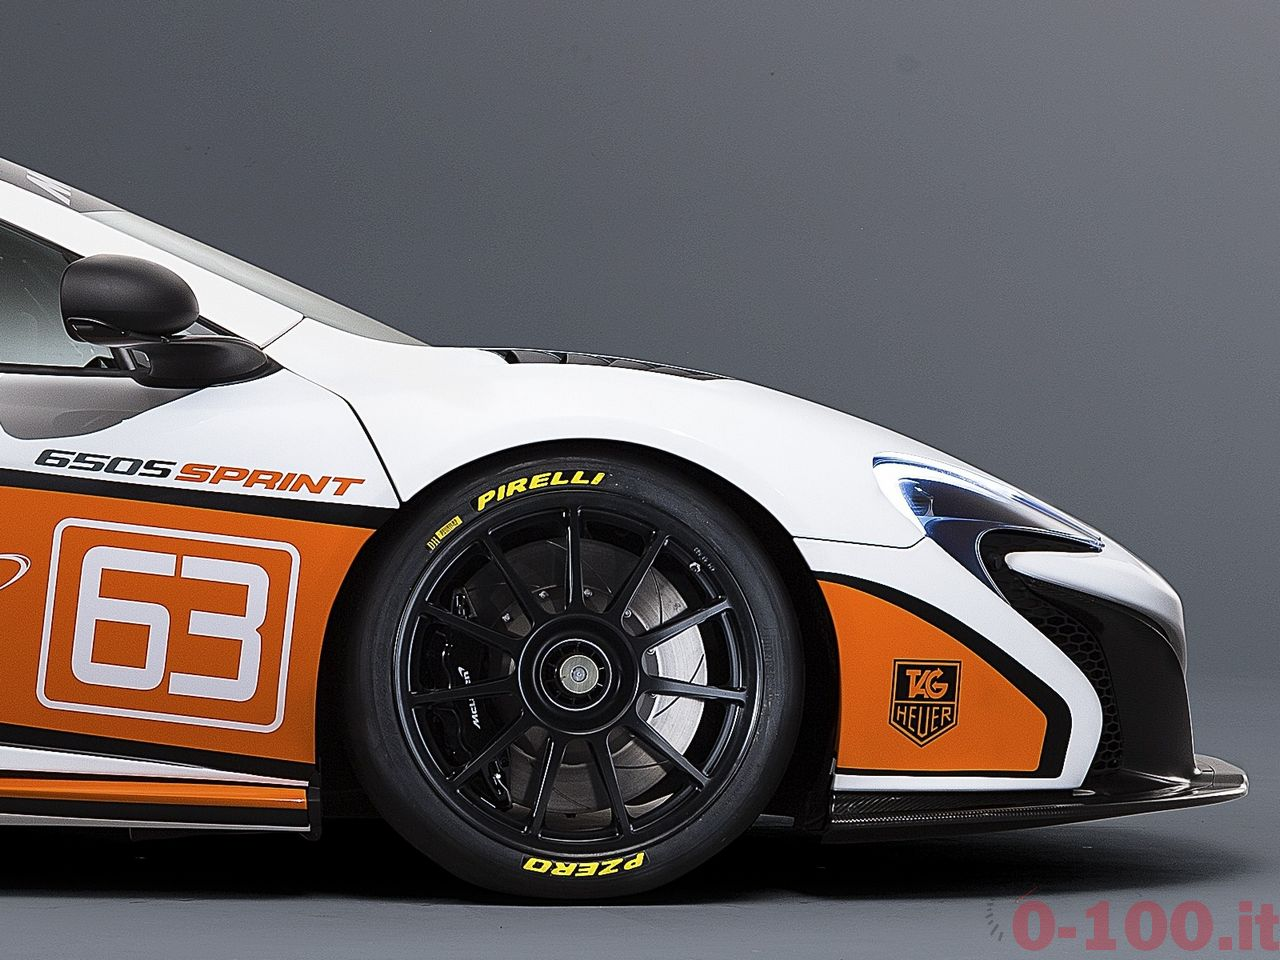 mclaren-650s-sprint-0-100-price-prezzo_9